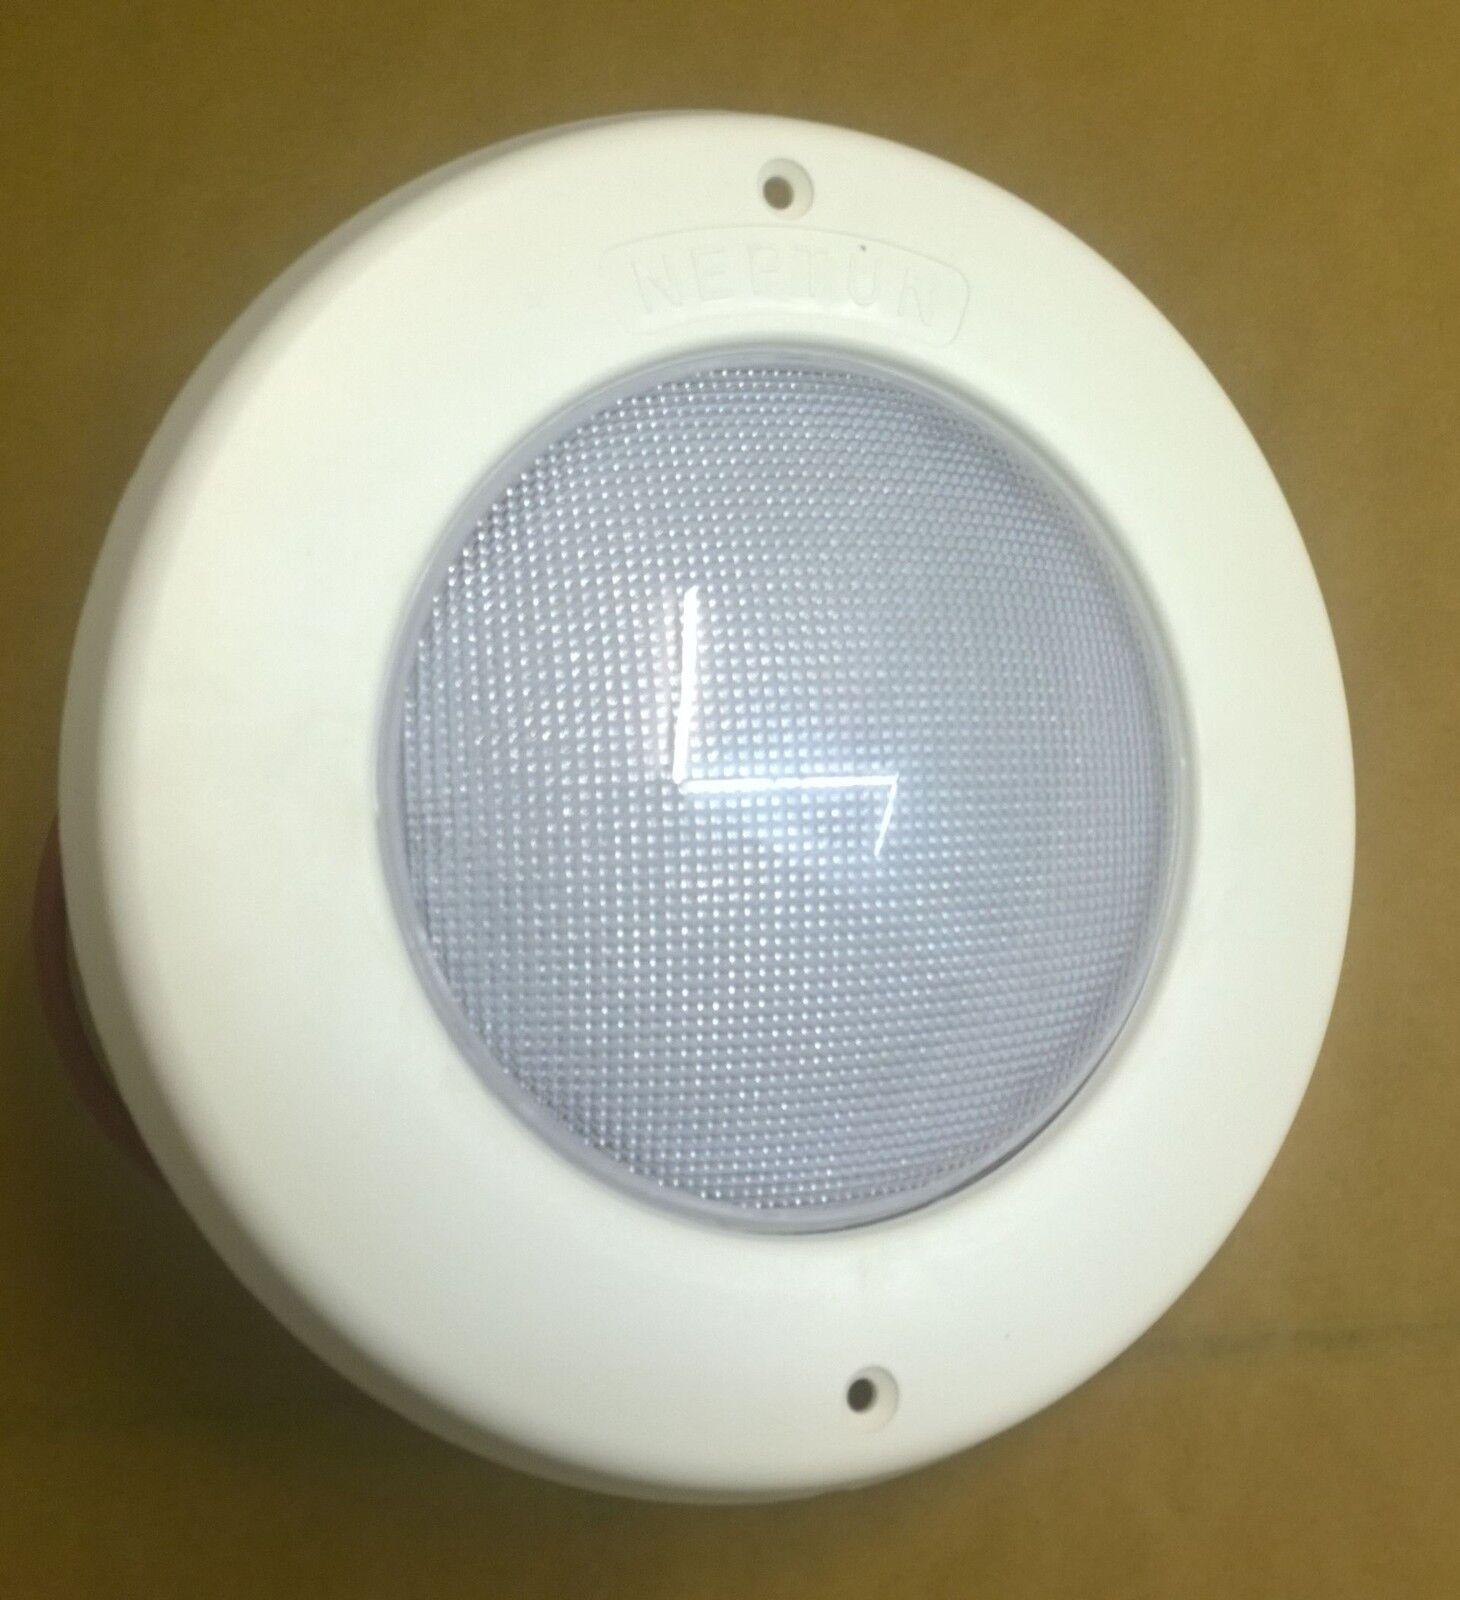 Illuminazione piscina neptung maxi LED PISCINA LAMPADA FANALE FARO LUCE PISCINA